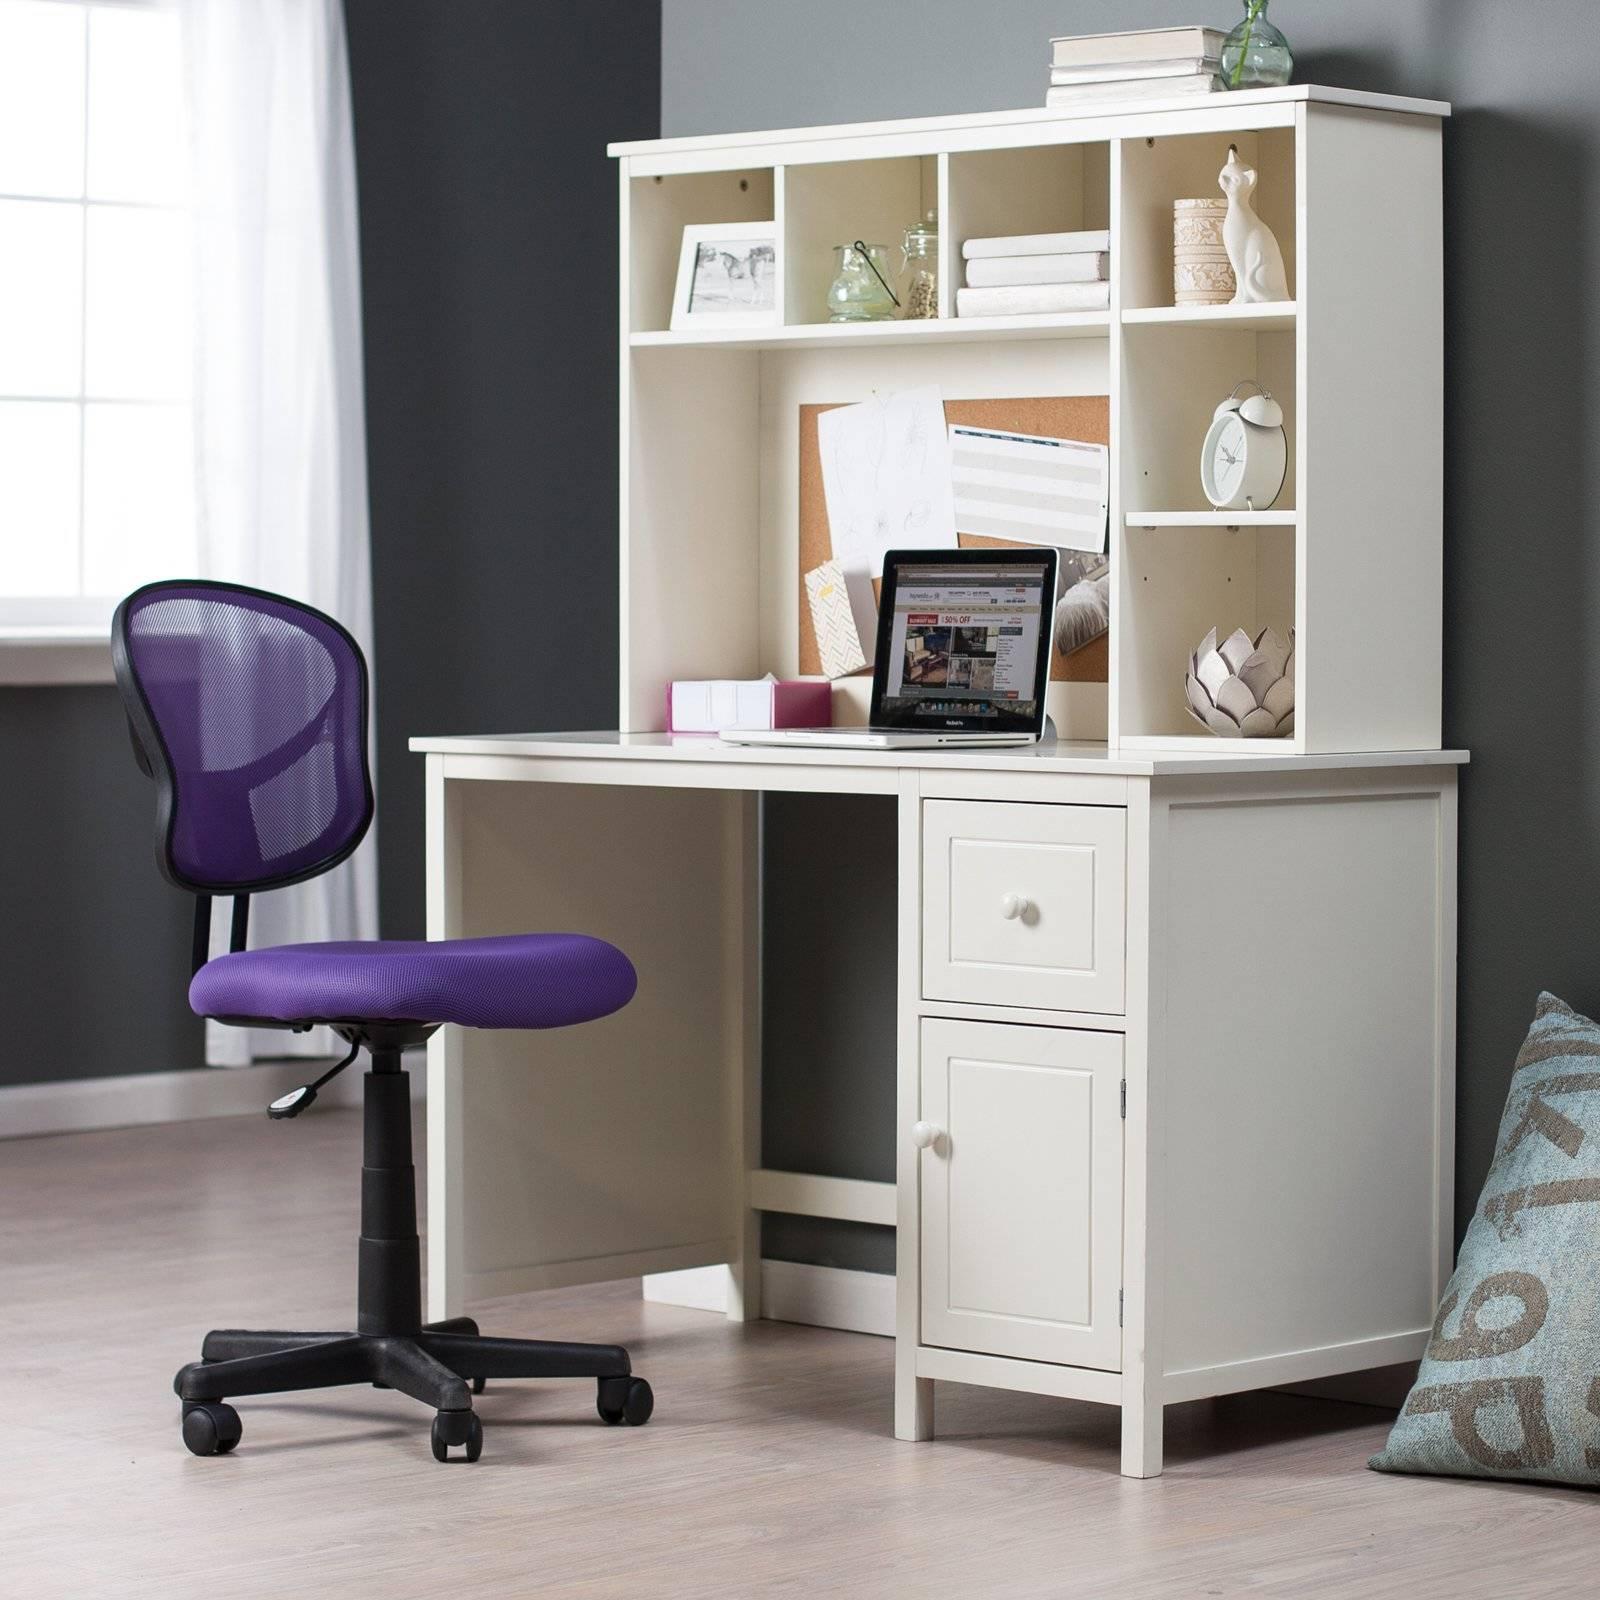 Furniture Design Ideas for Study Table Desk